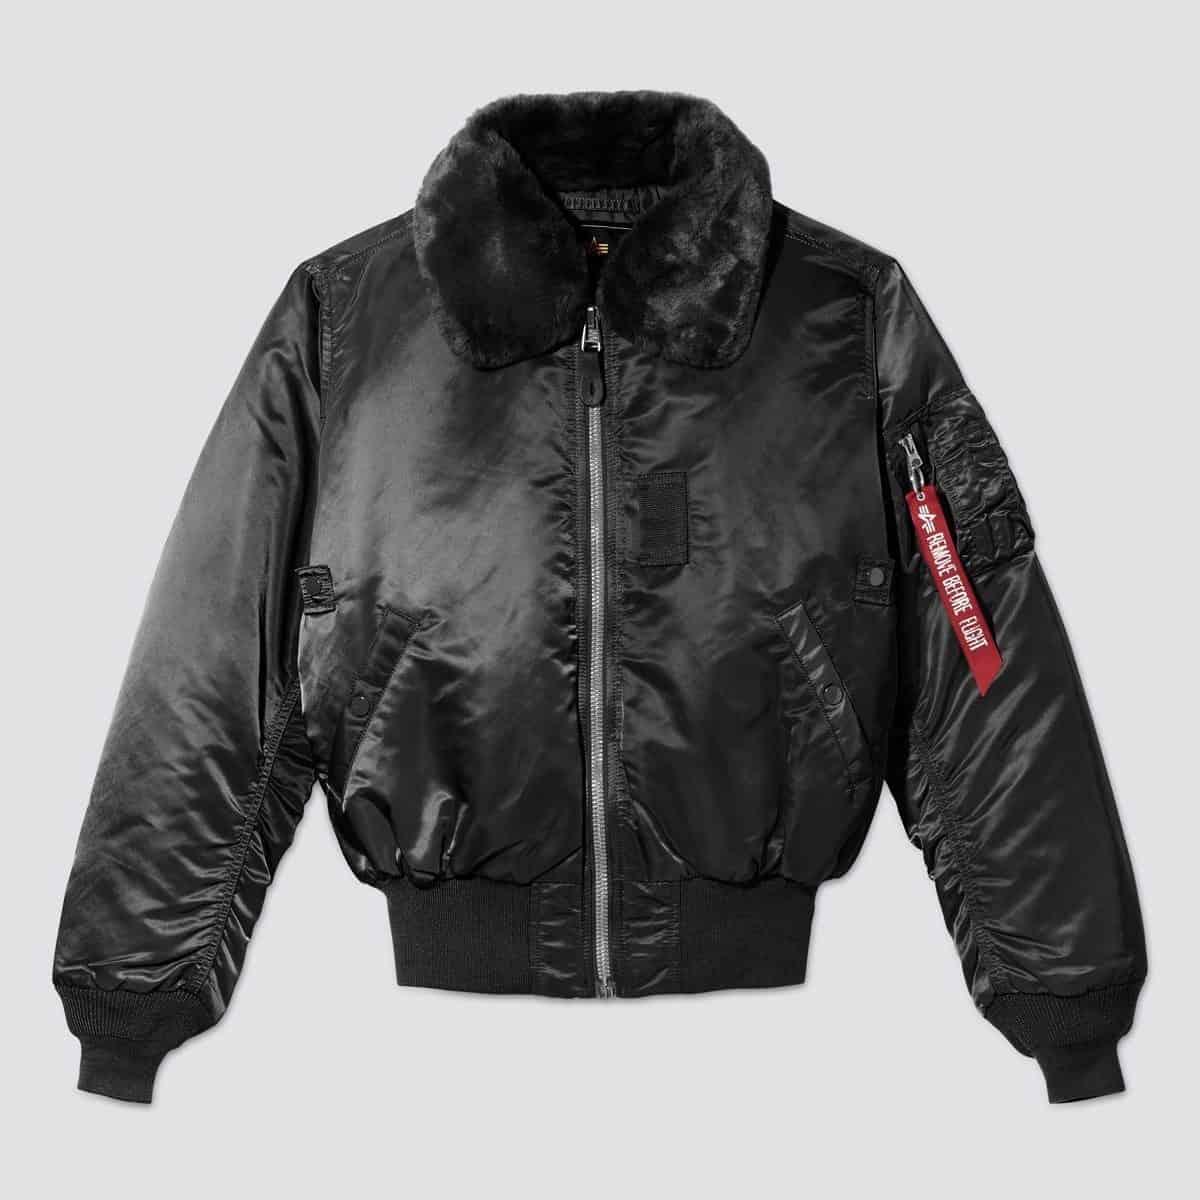 Alpha Industries B-15 Winter Jacket